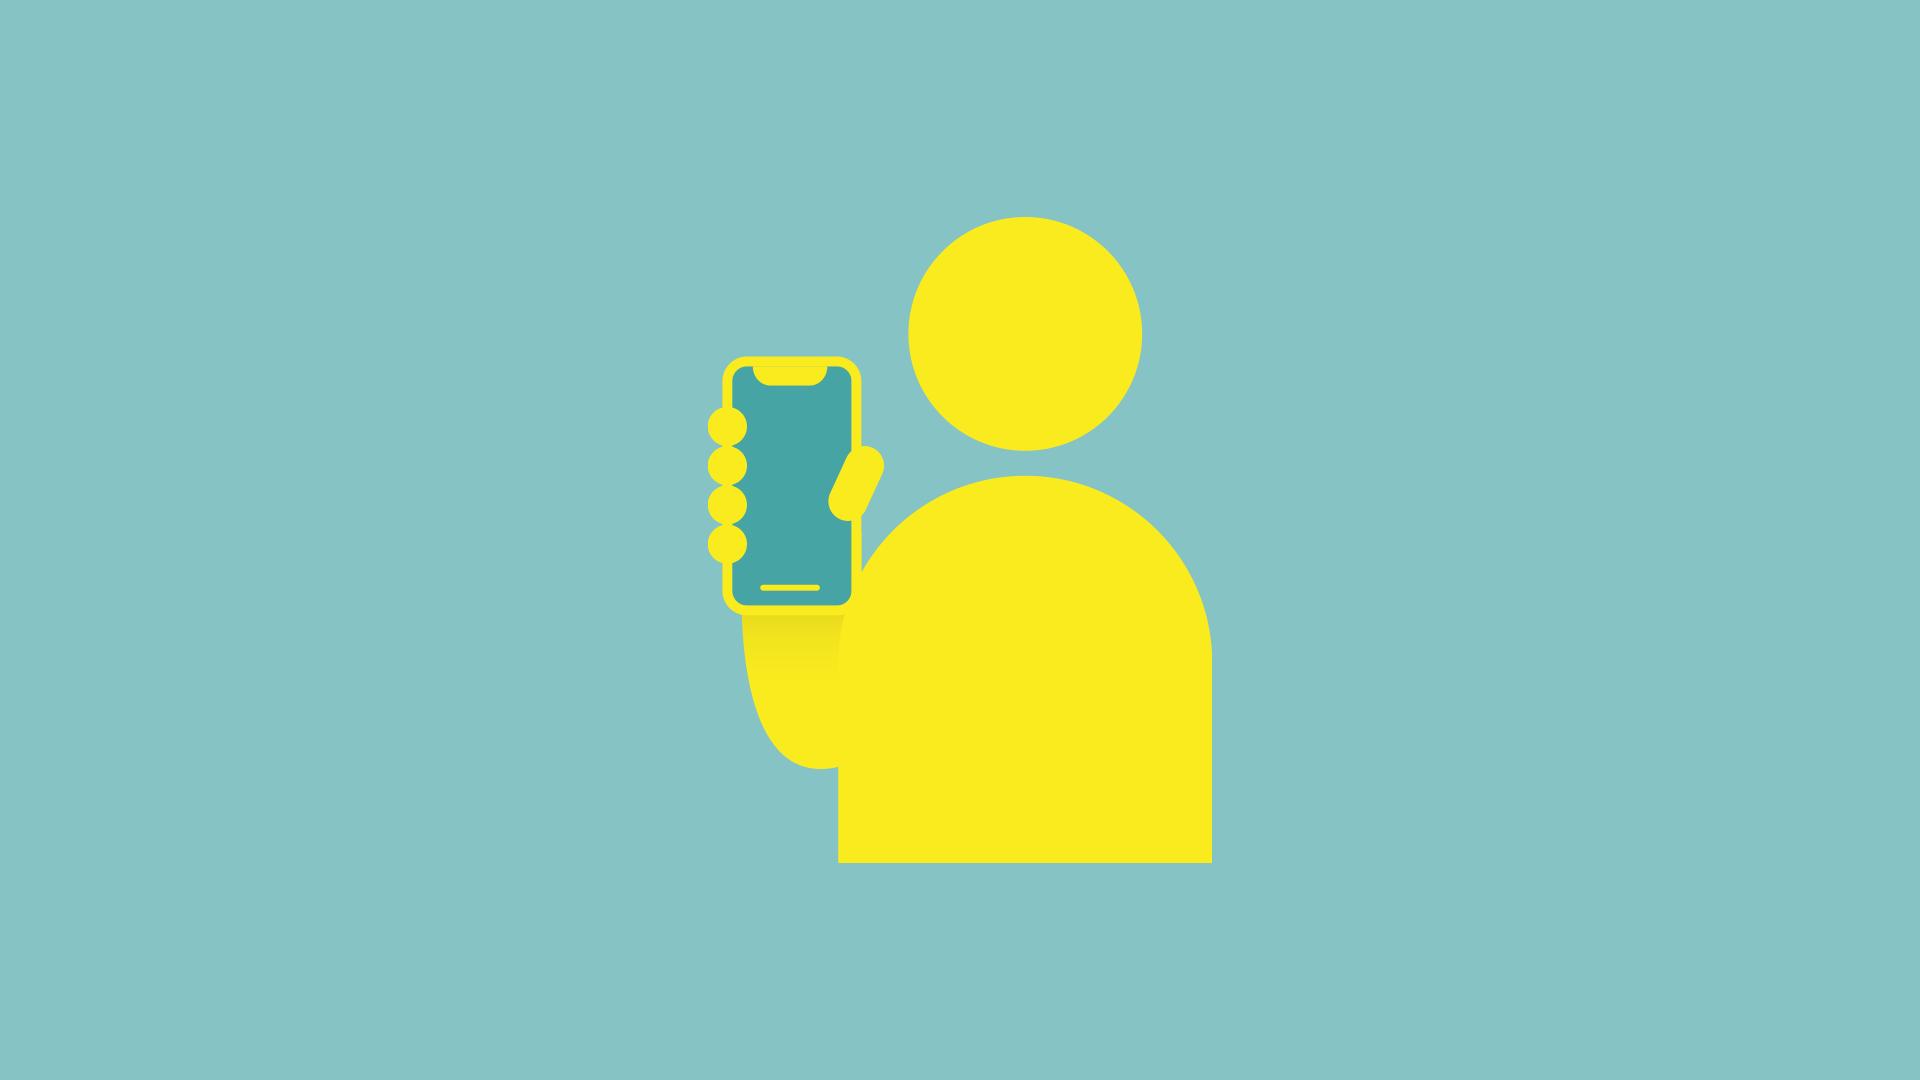 DAAS_Mobile_EndUser_Yellow_BG.png